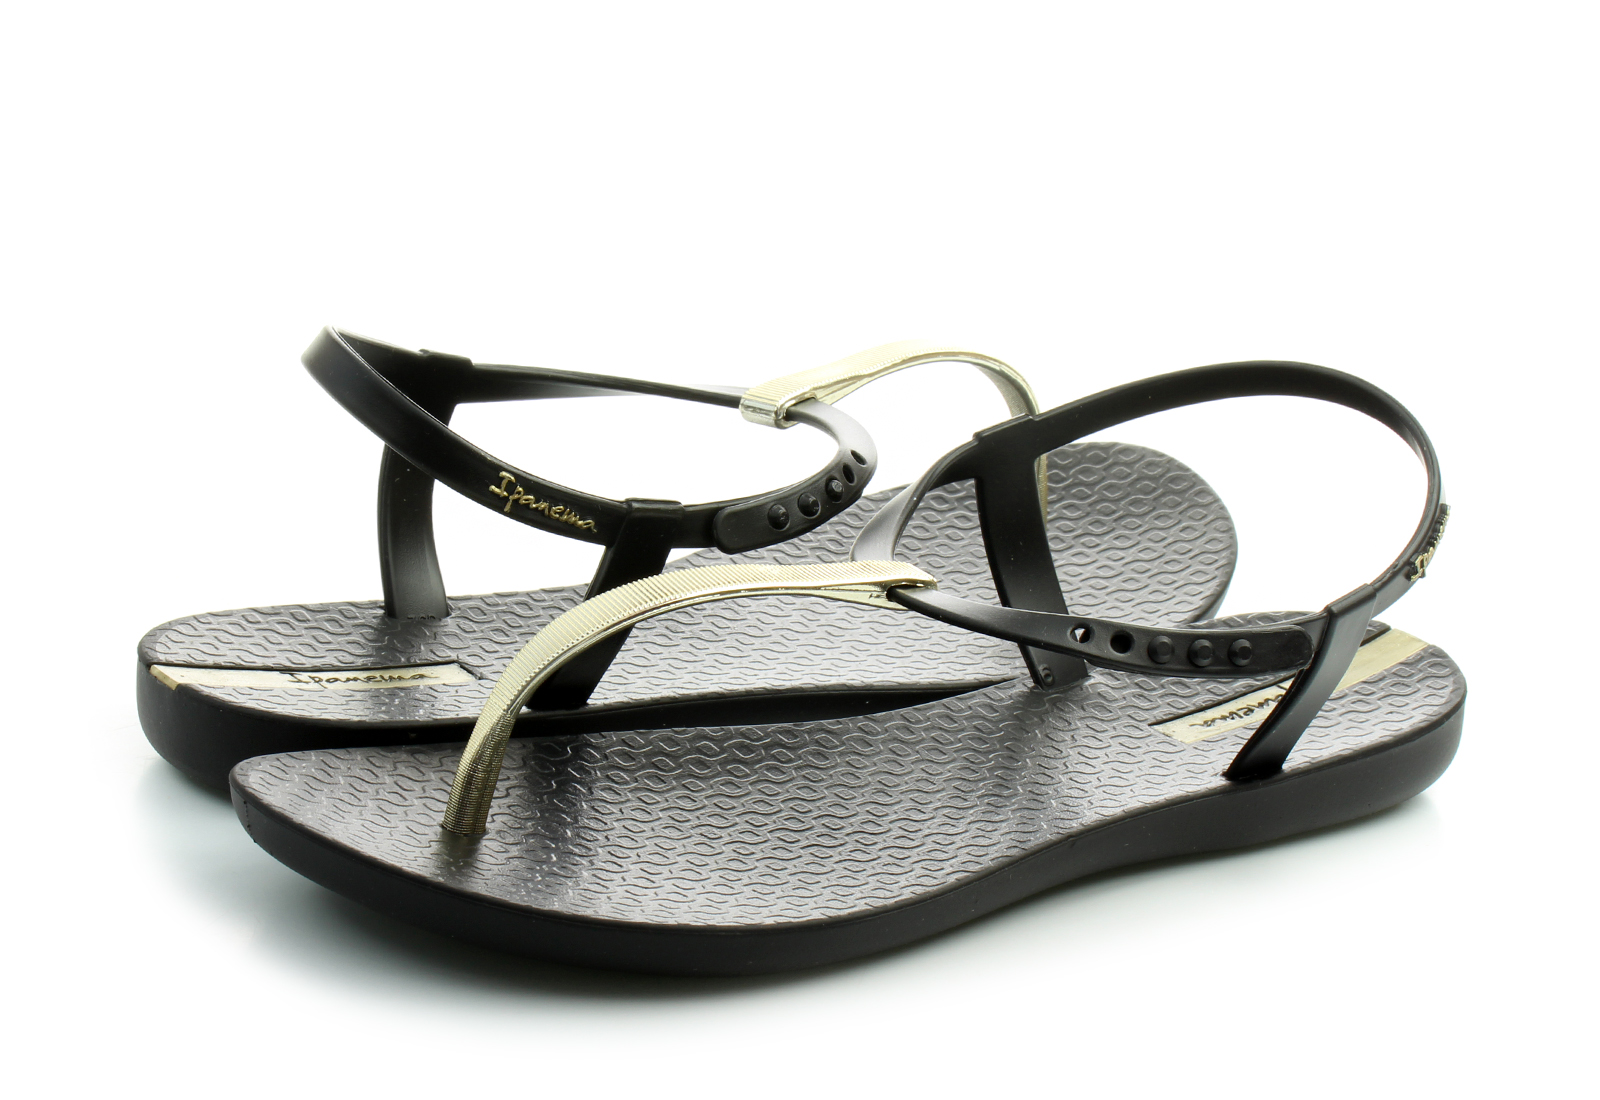 52330a8bc Ipanema Ravne Crne Sandale - Charm V Sandal Fem - Office Shoes ...